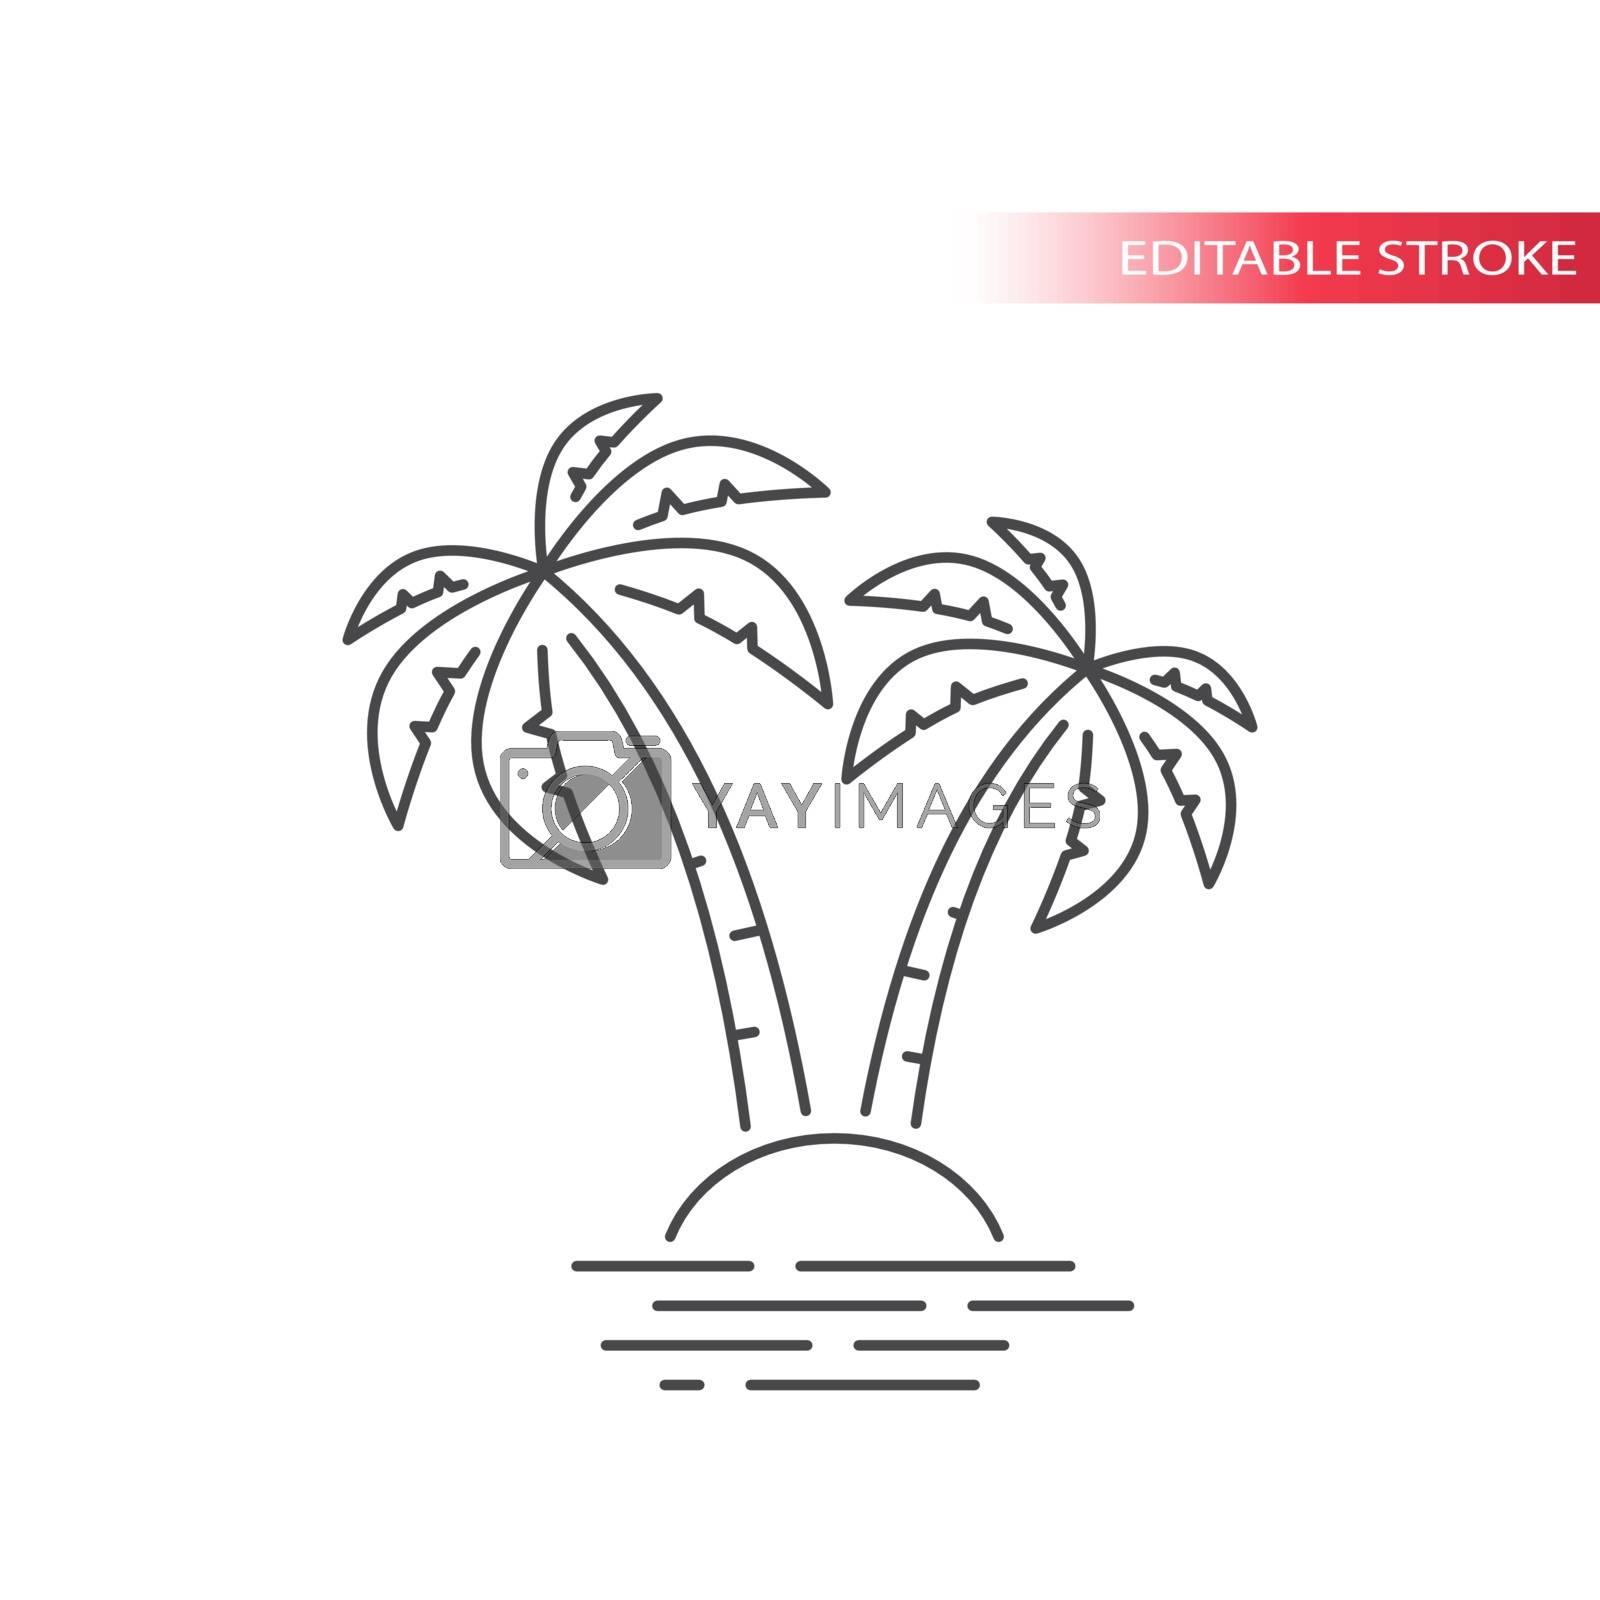 Outline, editable stroke vector.